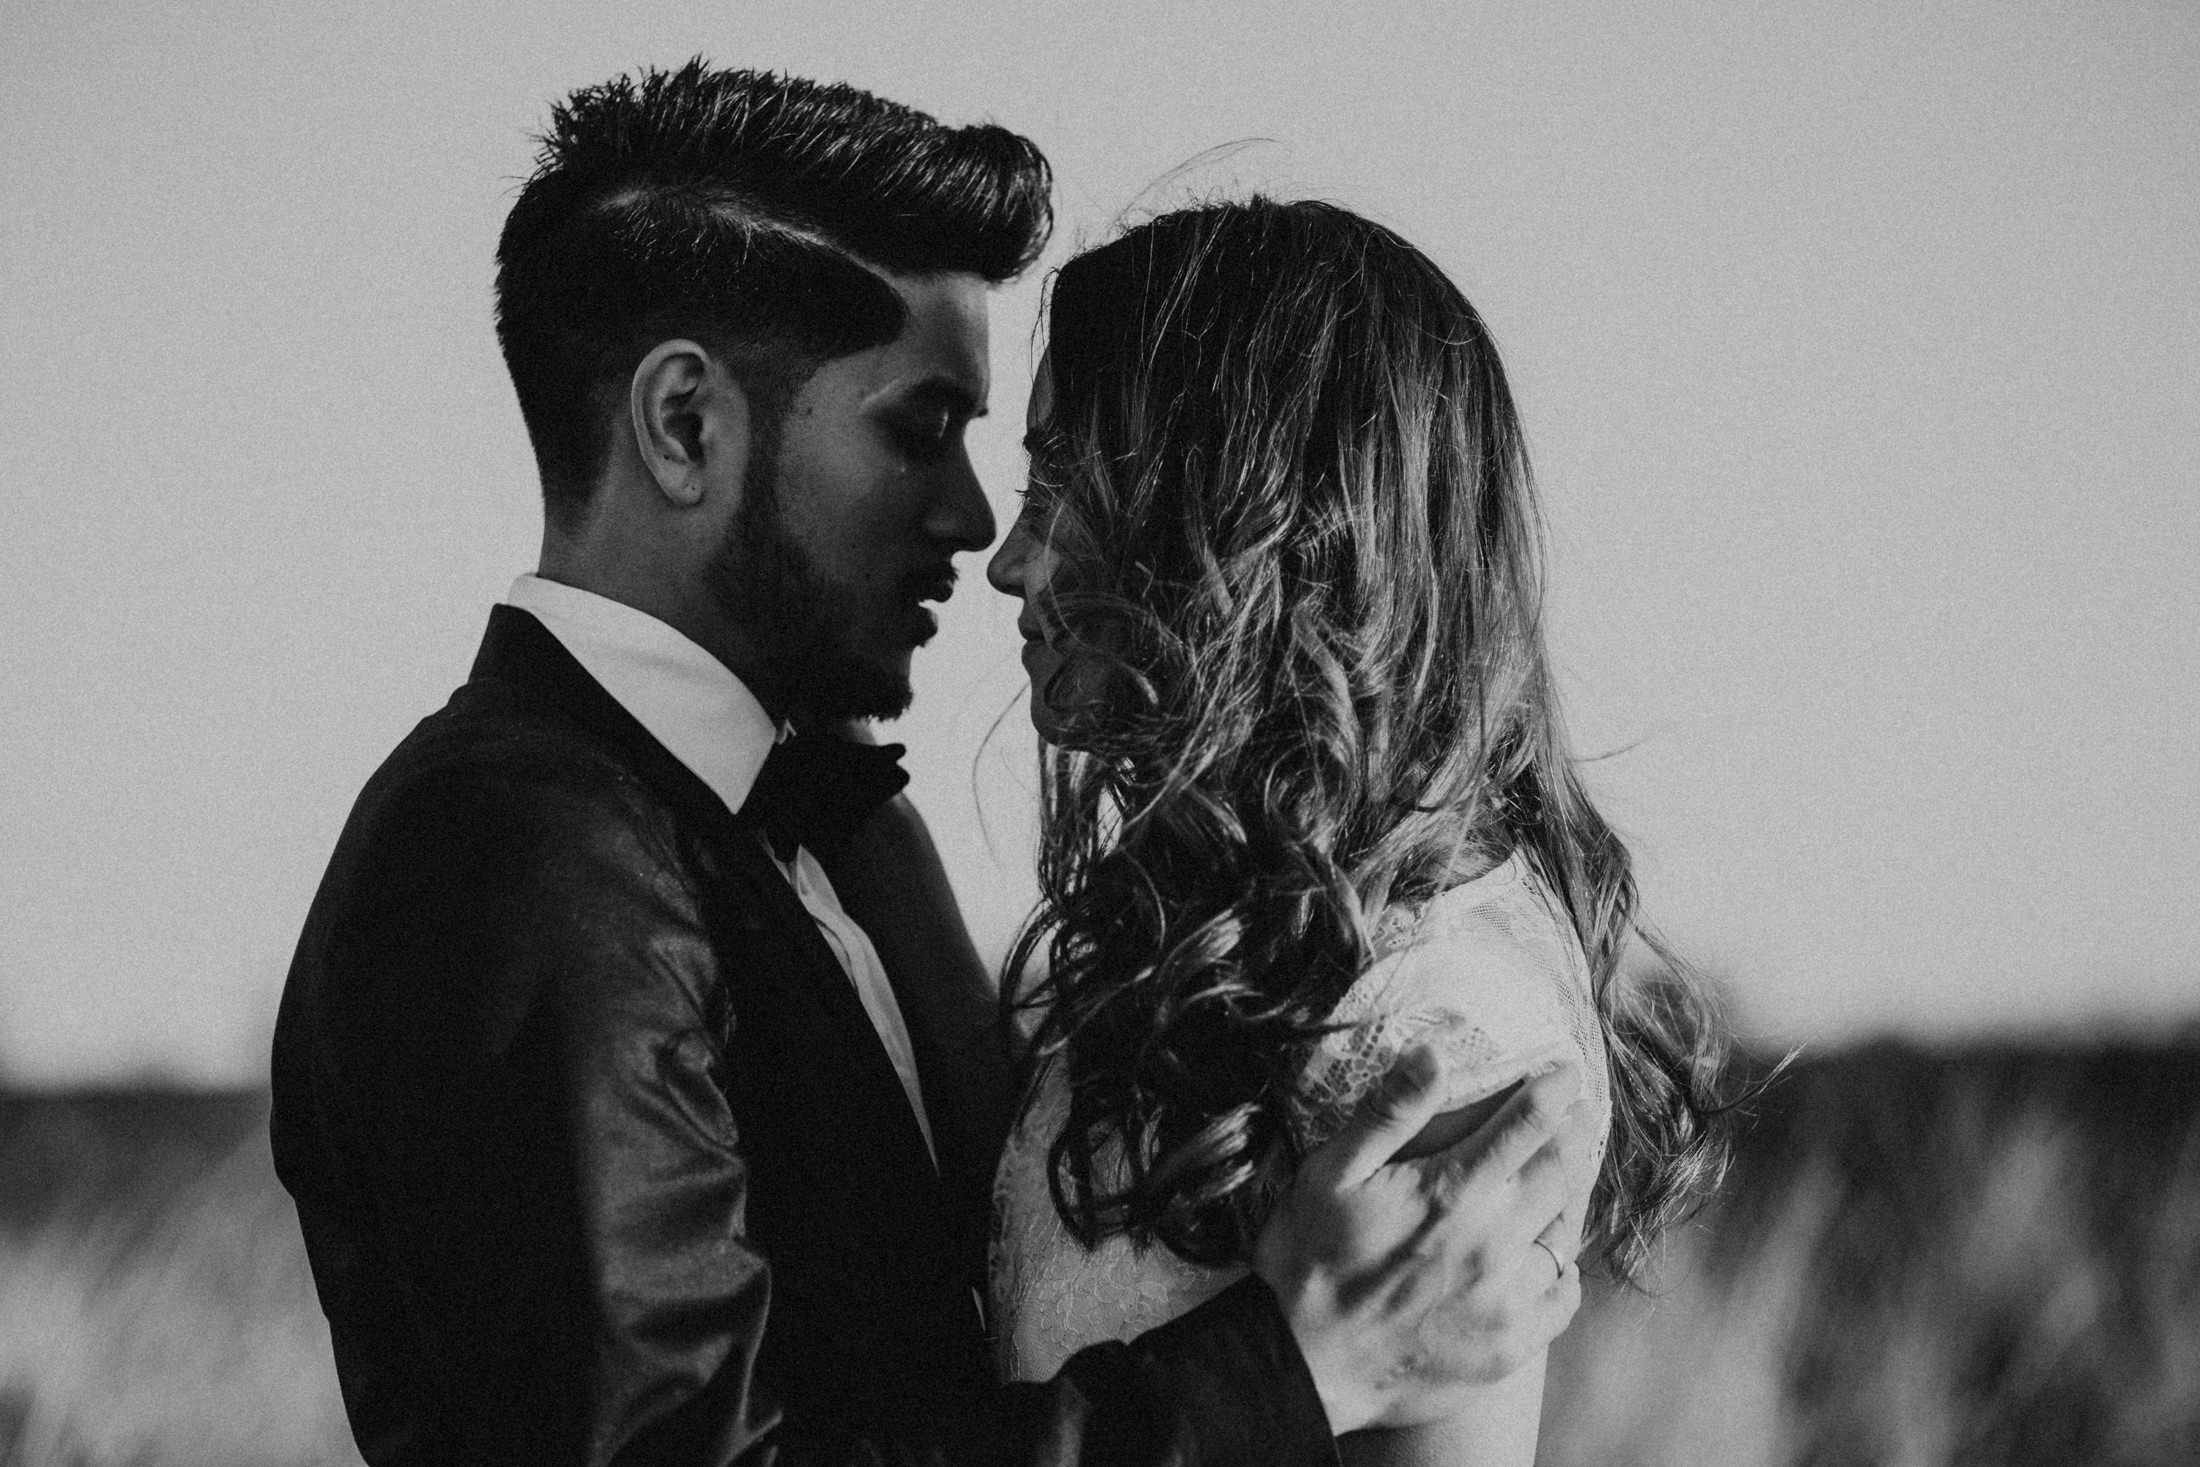 Wedding_Photographer_Mallorca_Daniela-Marquardt_Photography_CanaryIslands_Lanzarote_Iceland_Tuskany_Santorini_Portugal_Schweiz_Austria_Bayern_Elopement_Hochzeitsfotograf_Norddeichich_45